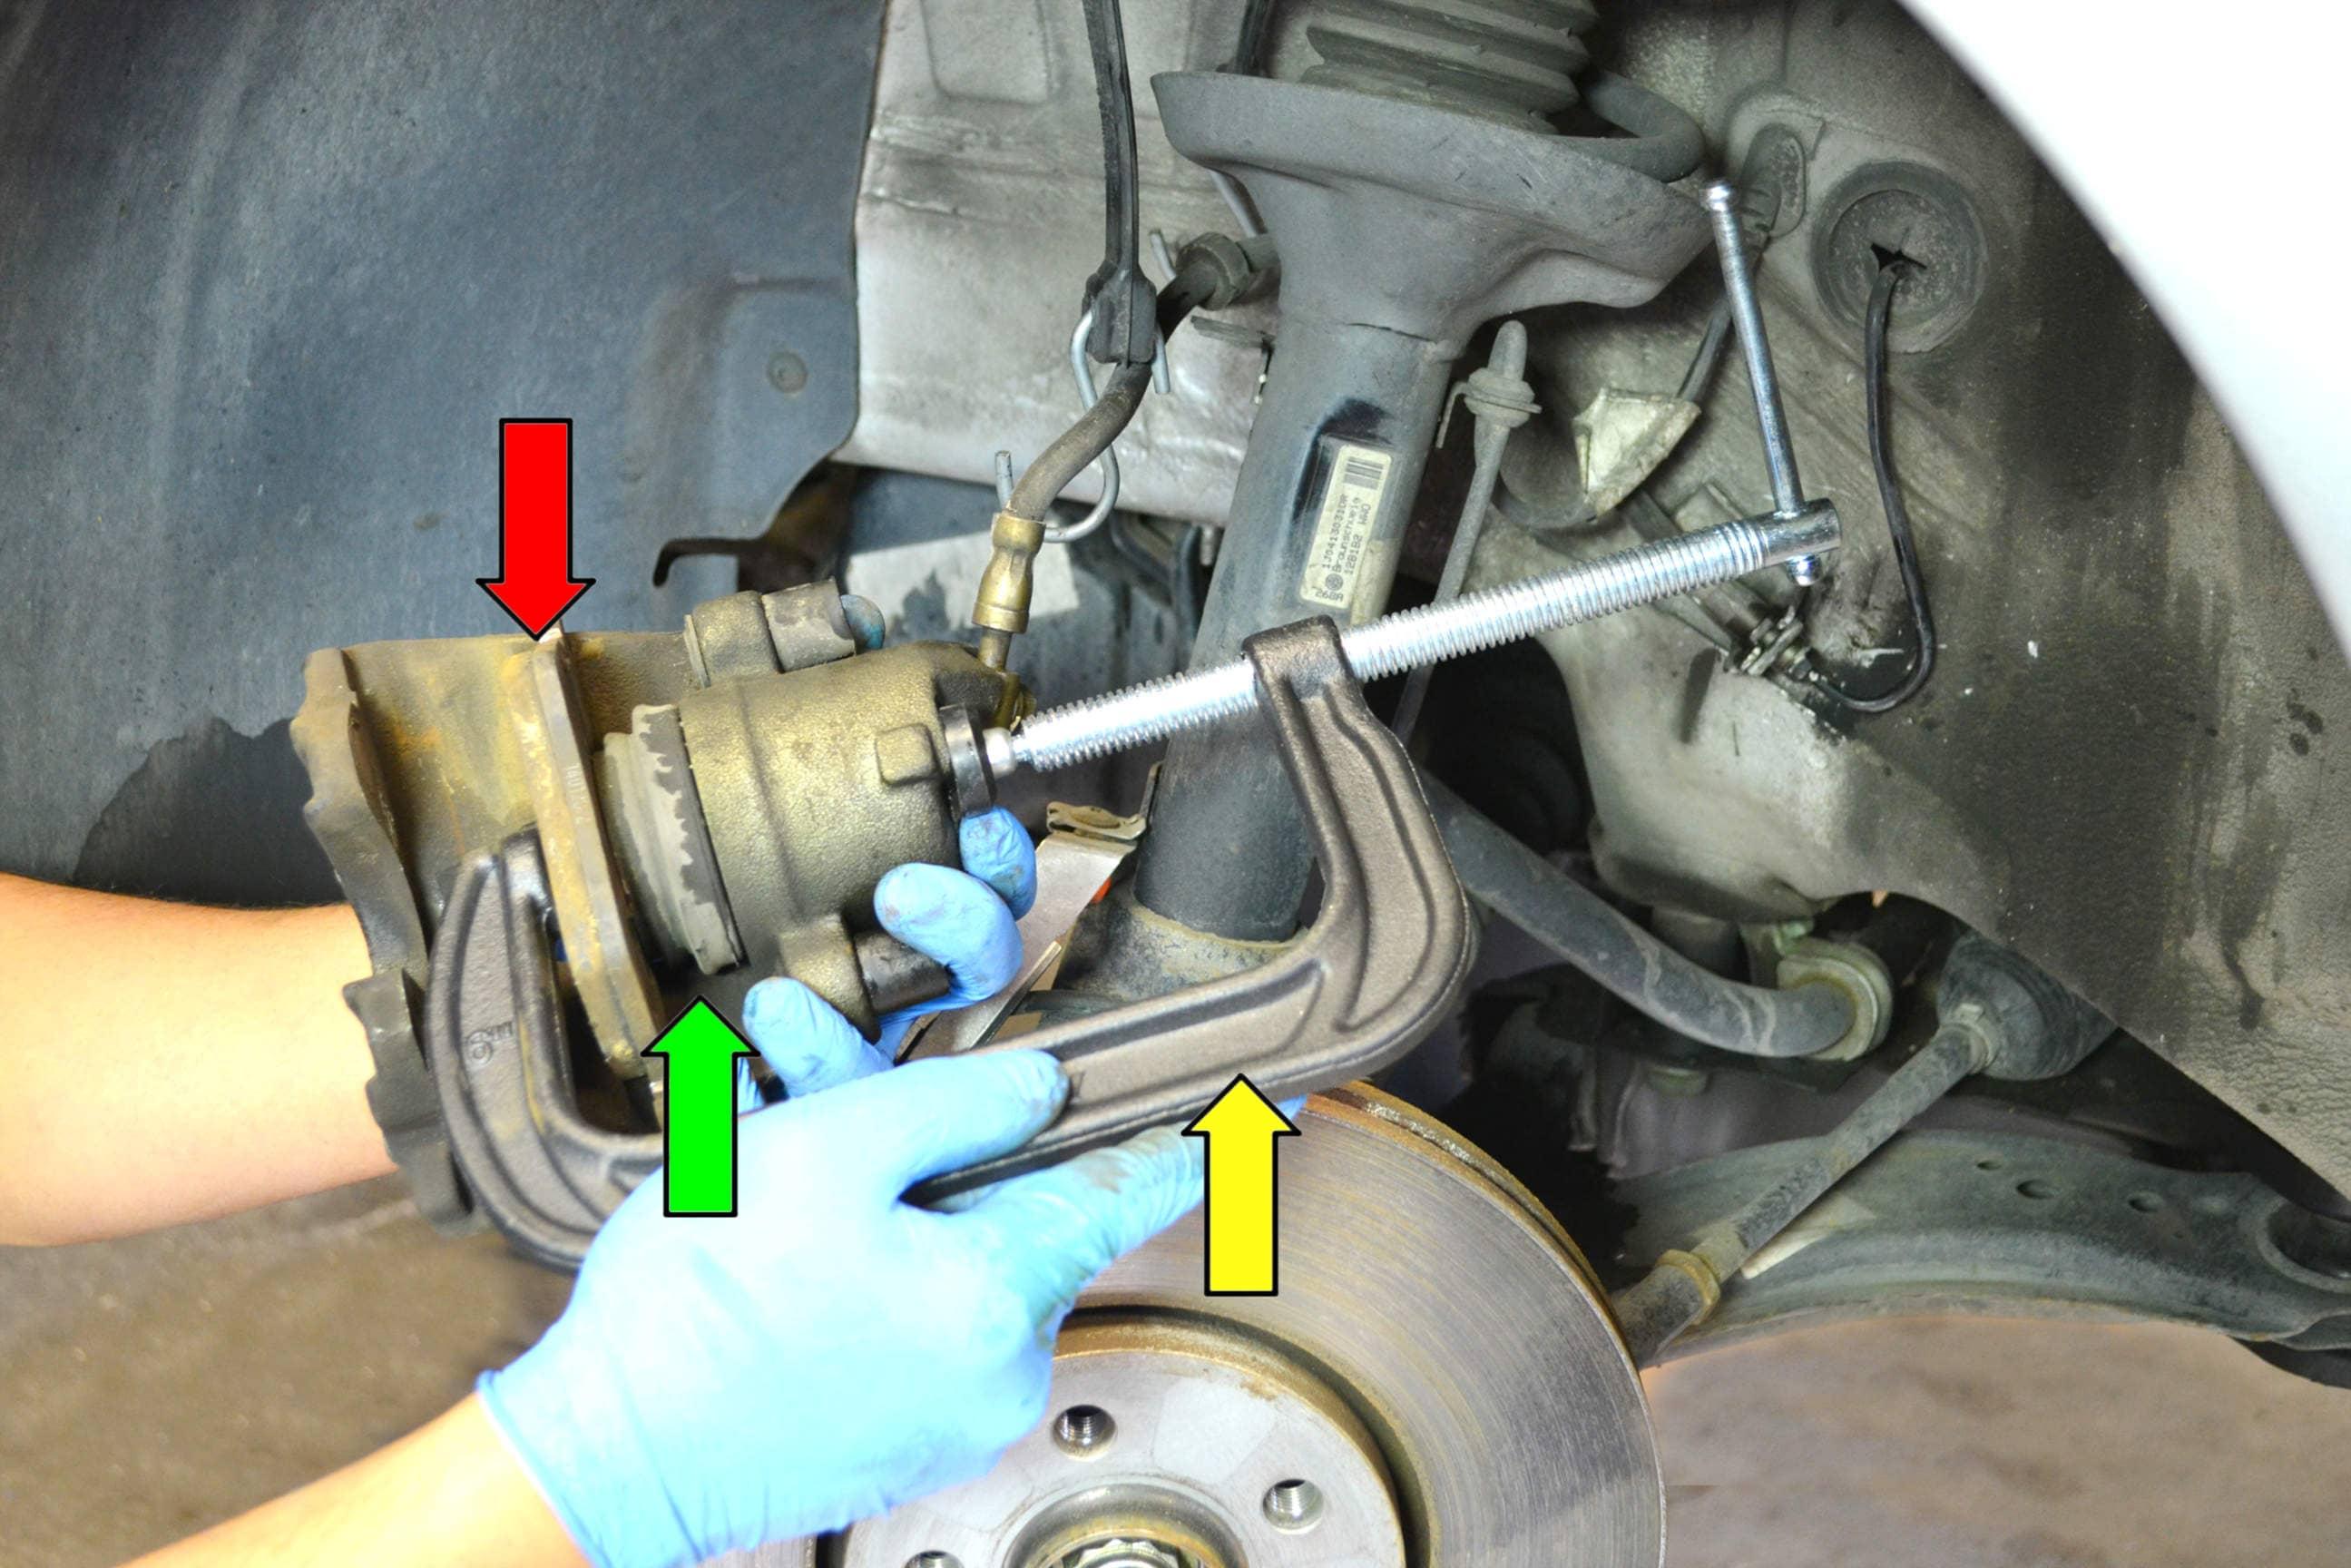 Volkswagen Golf Gti Mk V Front Brake Pads Replacement